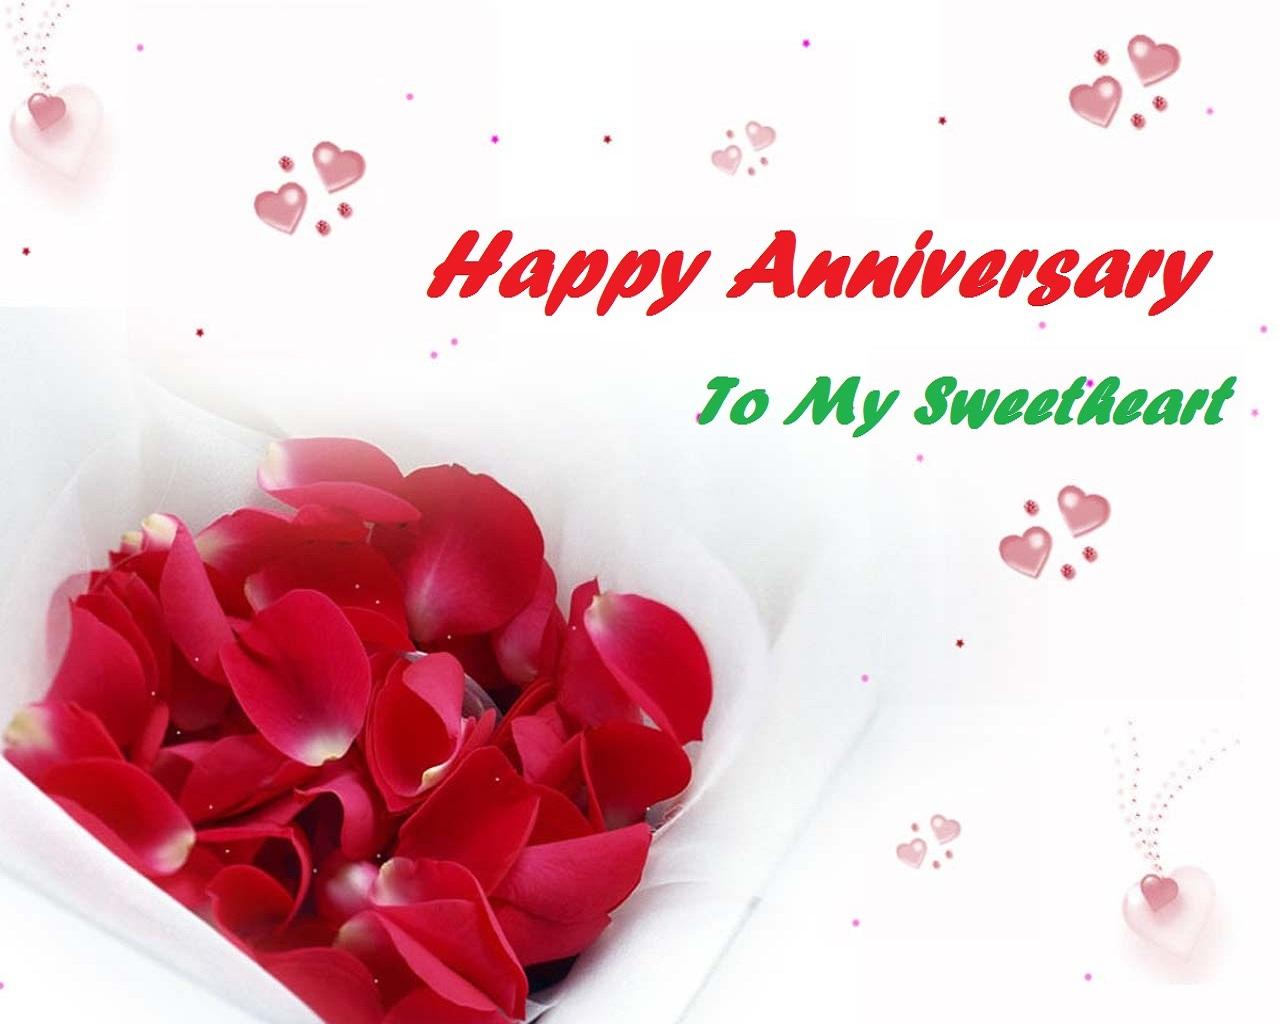 Wallpaper download marriage anniversary - Happy Wedding Anniversary Cute Hd Wide Hd Wallpapers Rocks